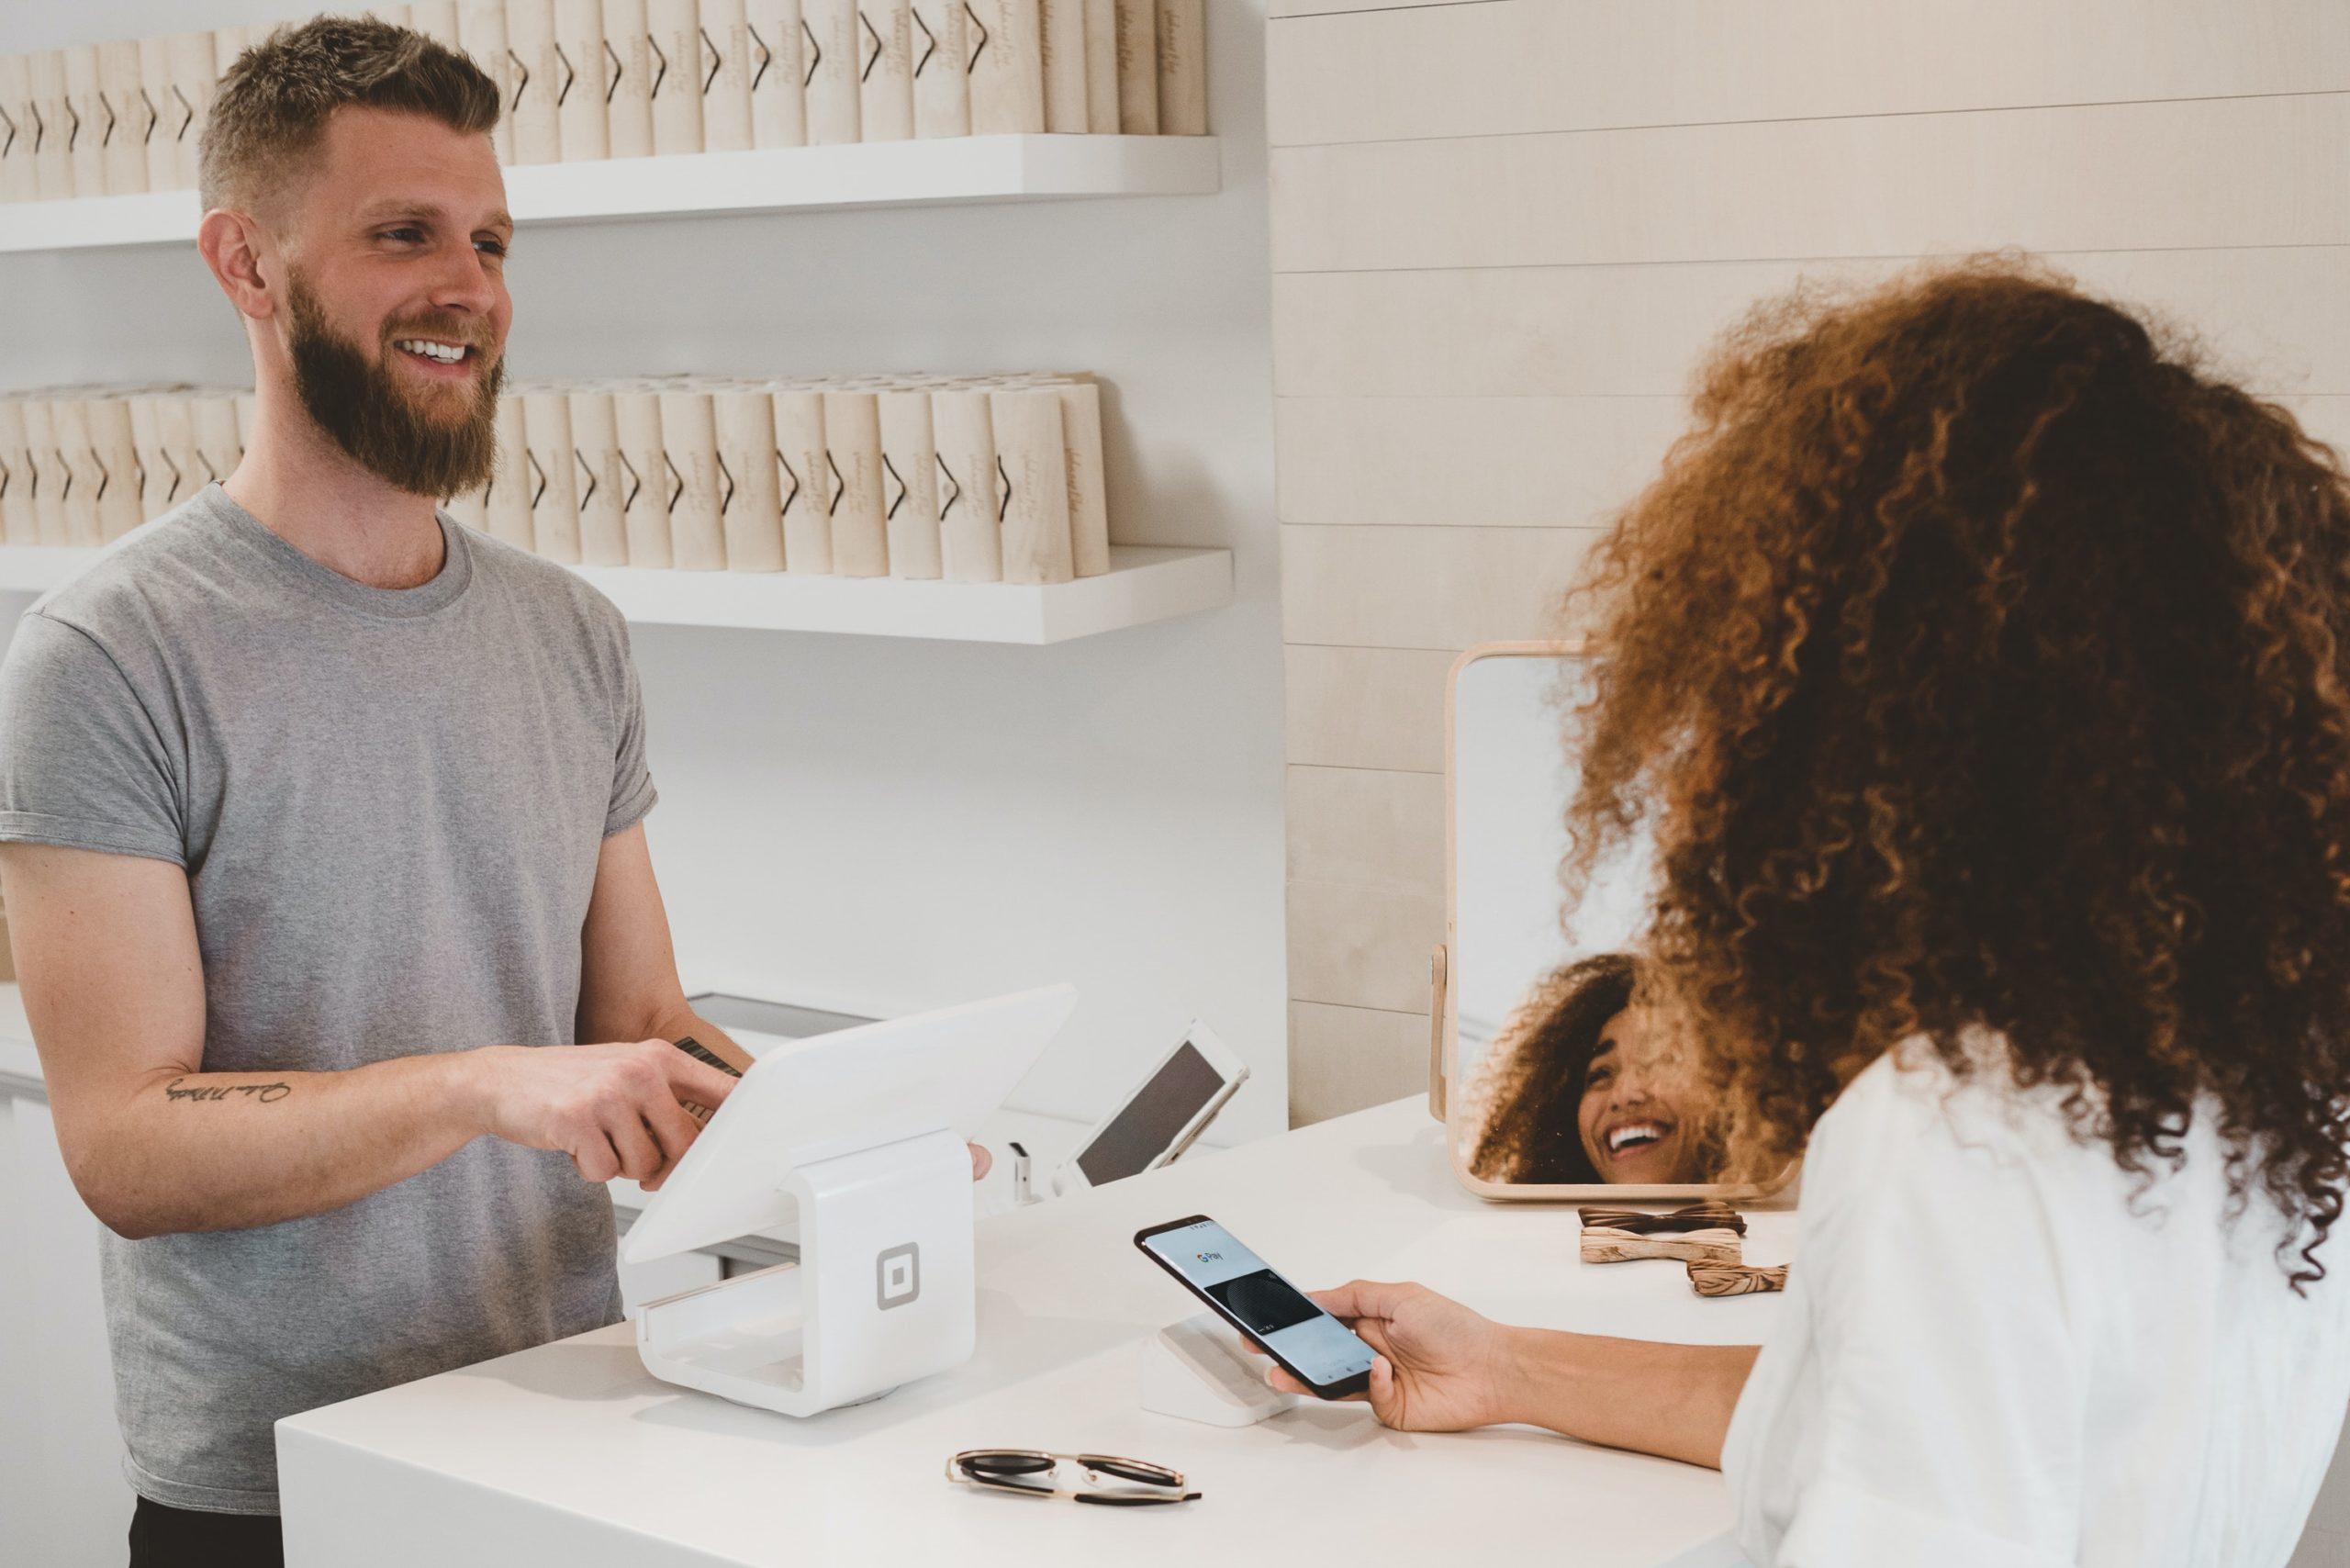 Customer segmentation and its importance